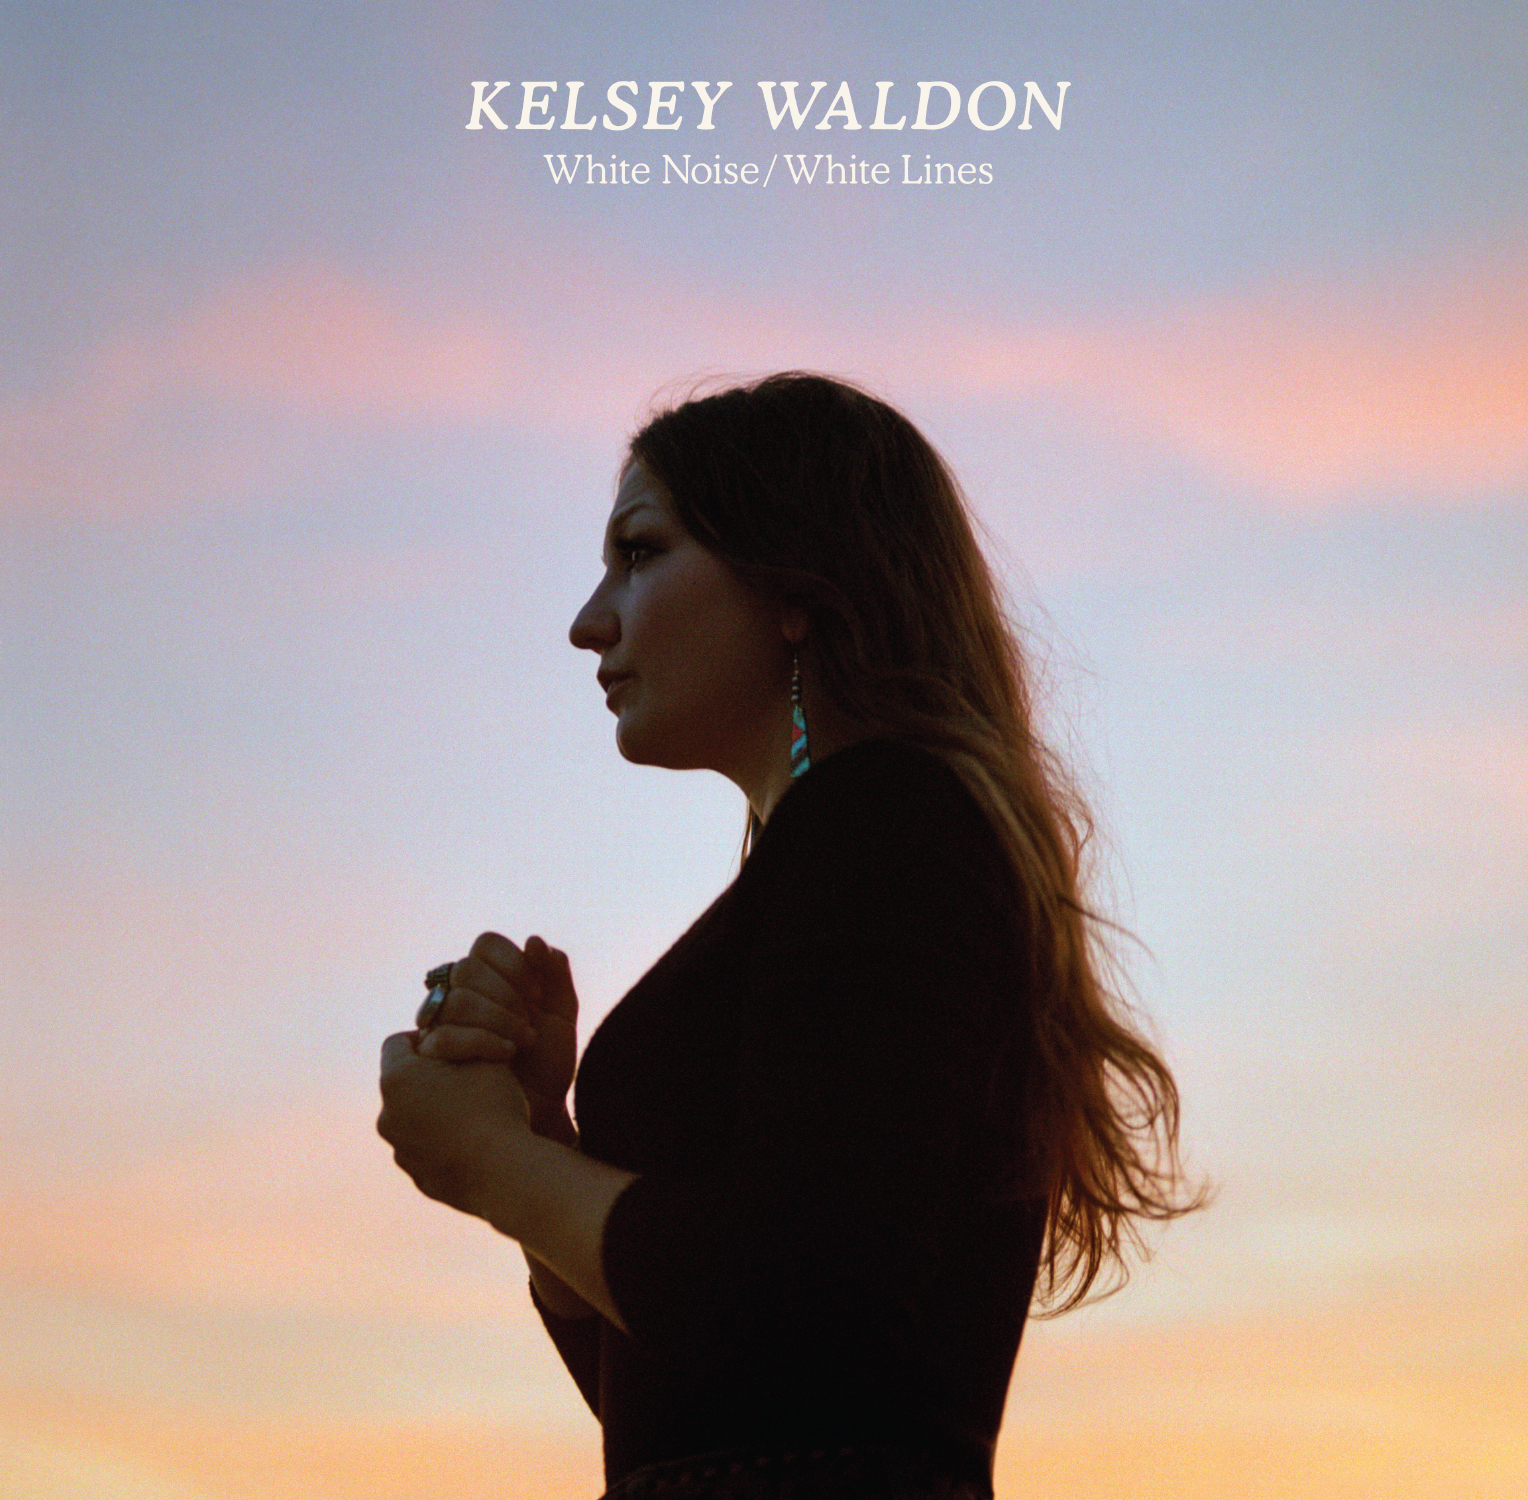 KelseyWaldonWhiteNoiseWhiteLinesAlbumCover.jpg